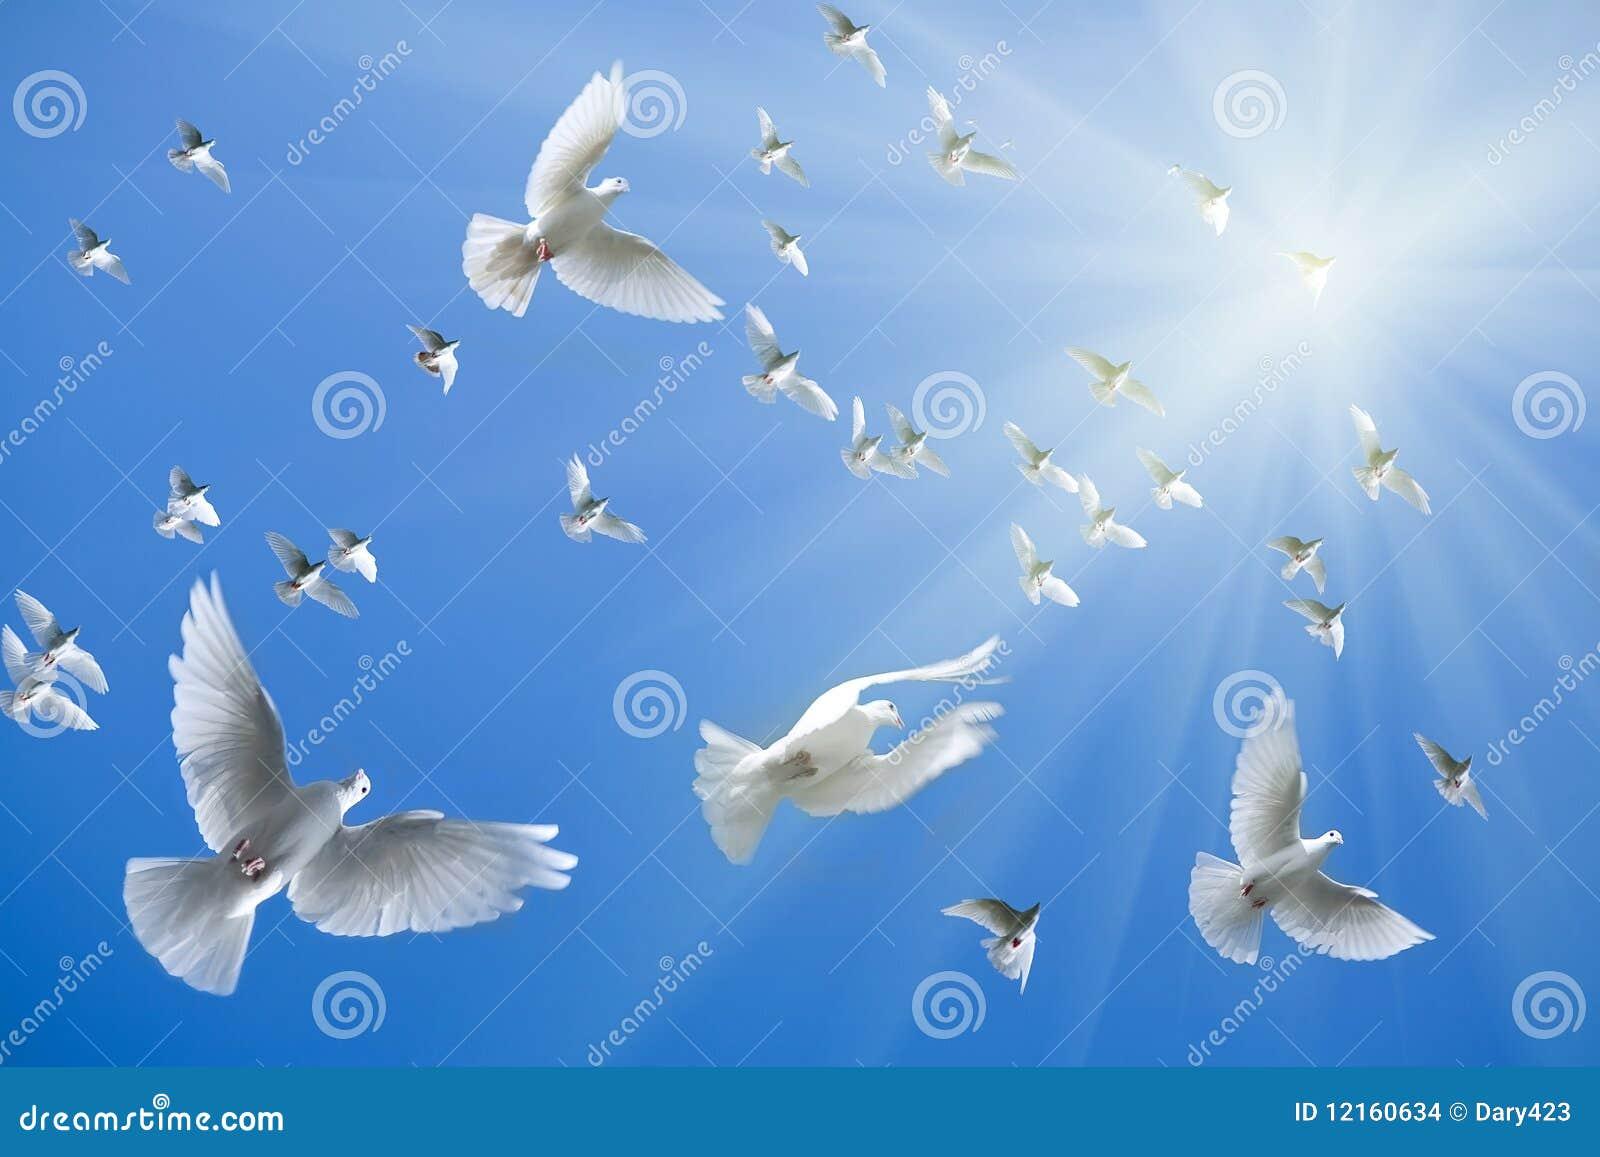 White Doves Flying Stock Images - Image: 12160634